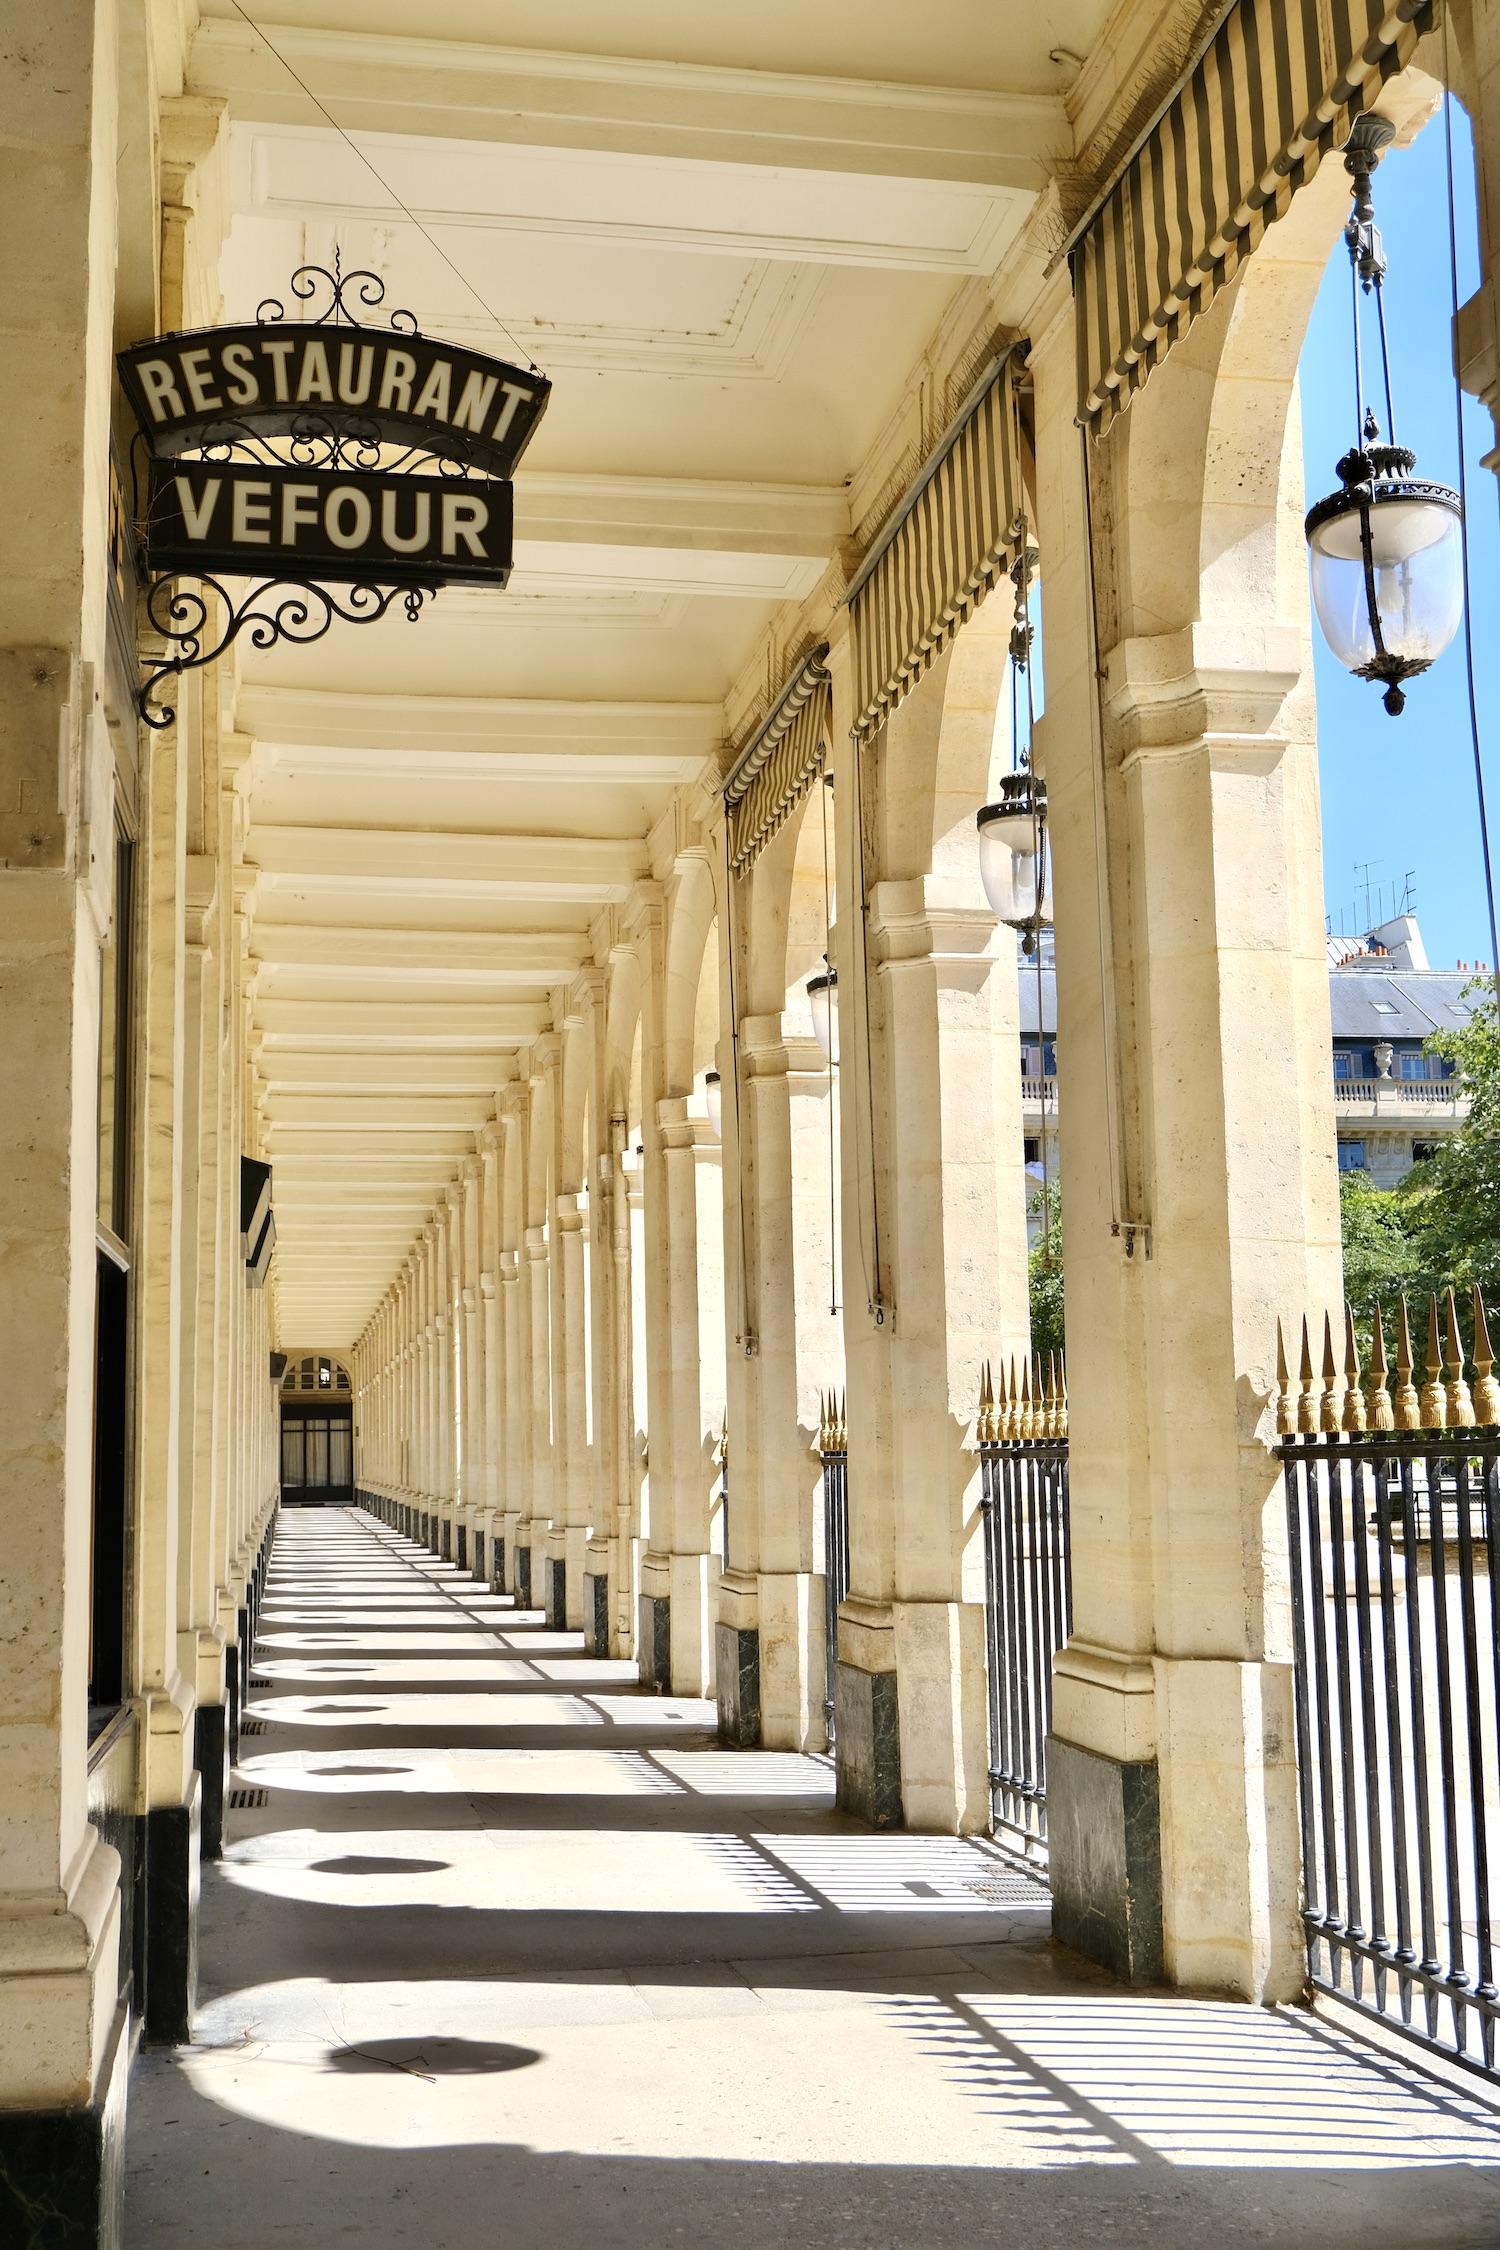 Restaurant Vefour Sign Palais-Royal